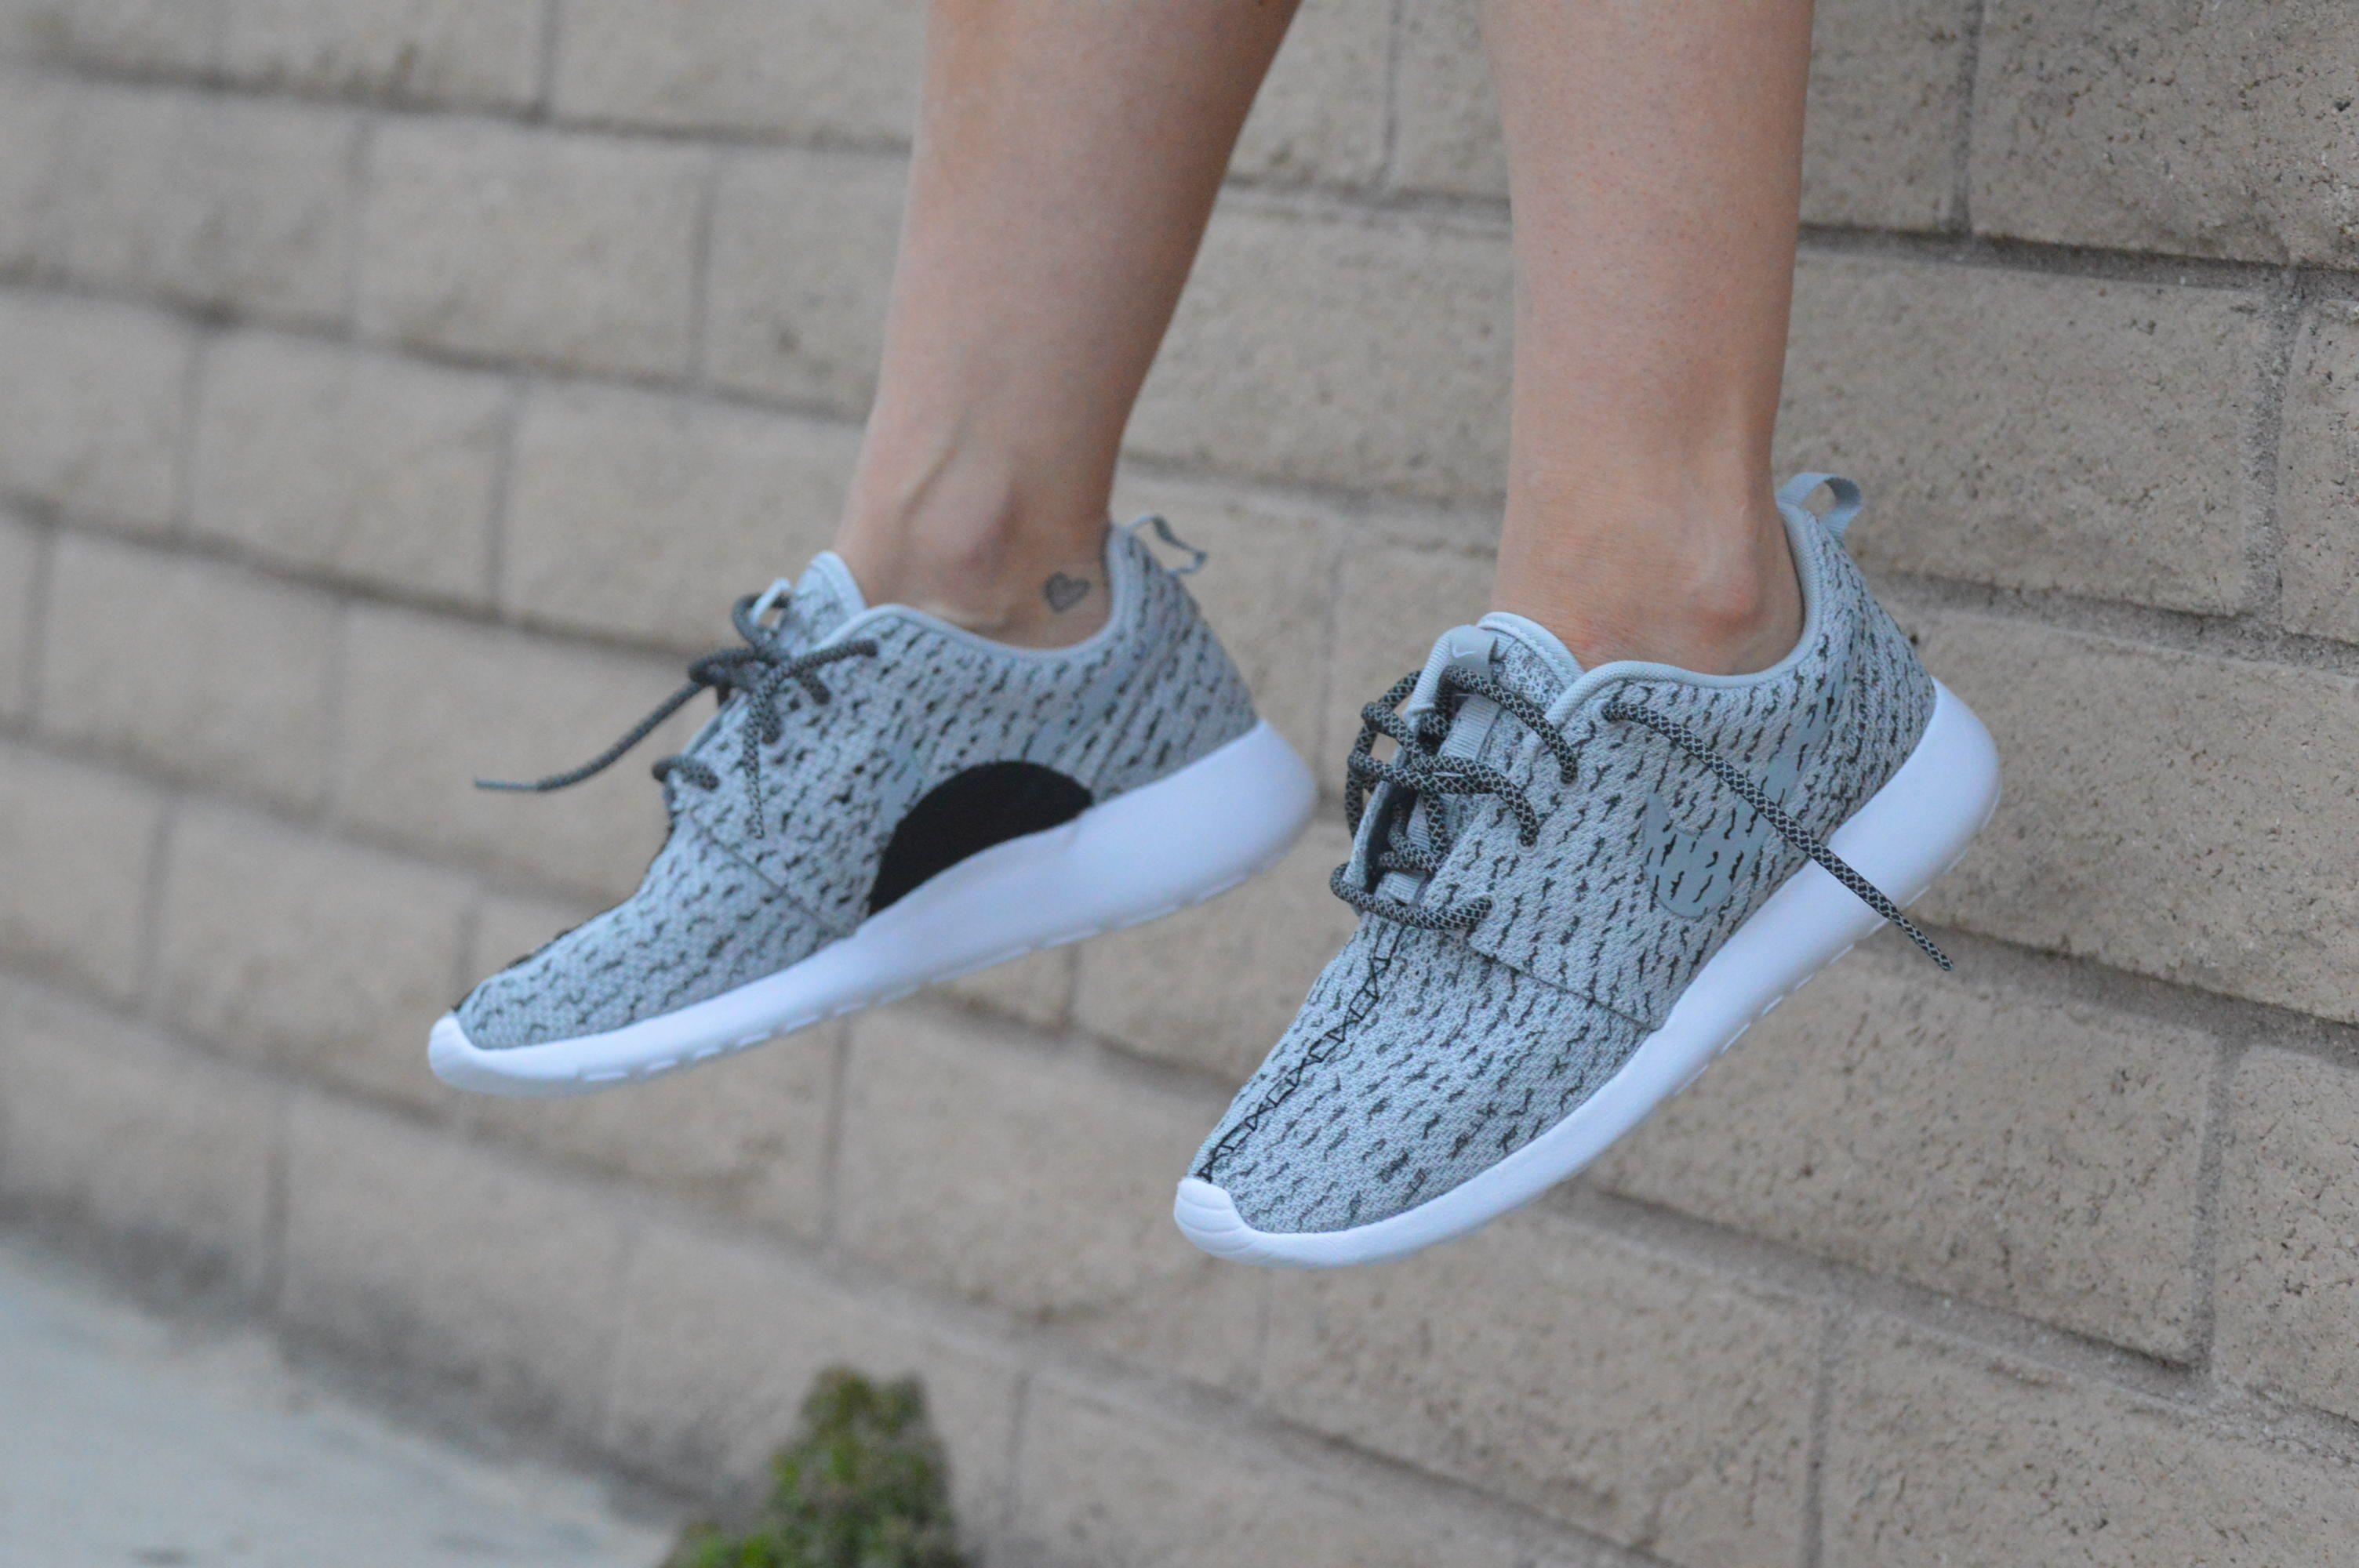 Adidas Yeezy Boost 350 - Custom Hand Painted Nike Roshe One